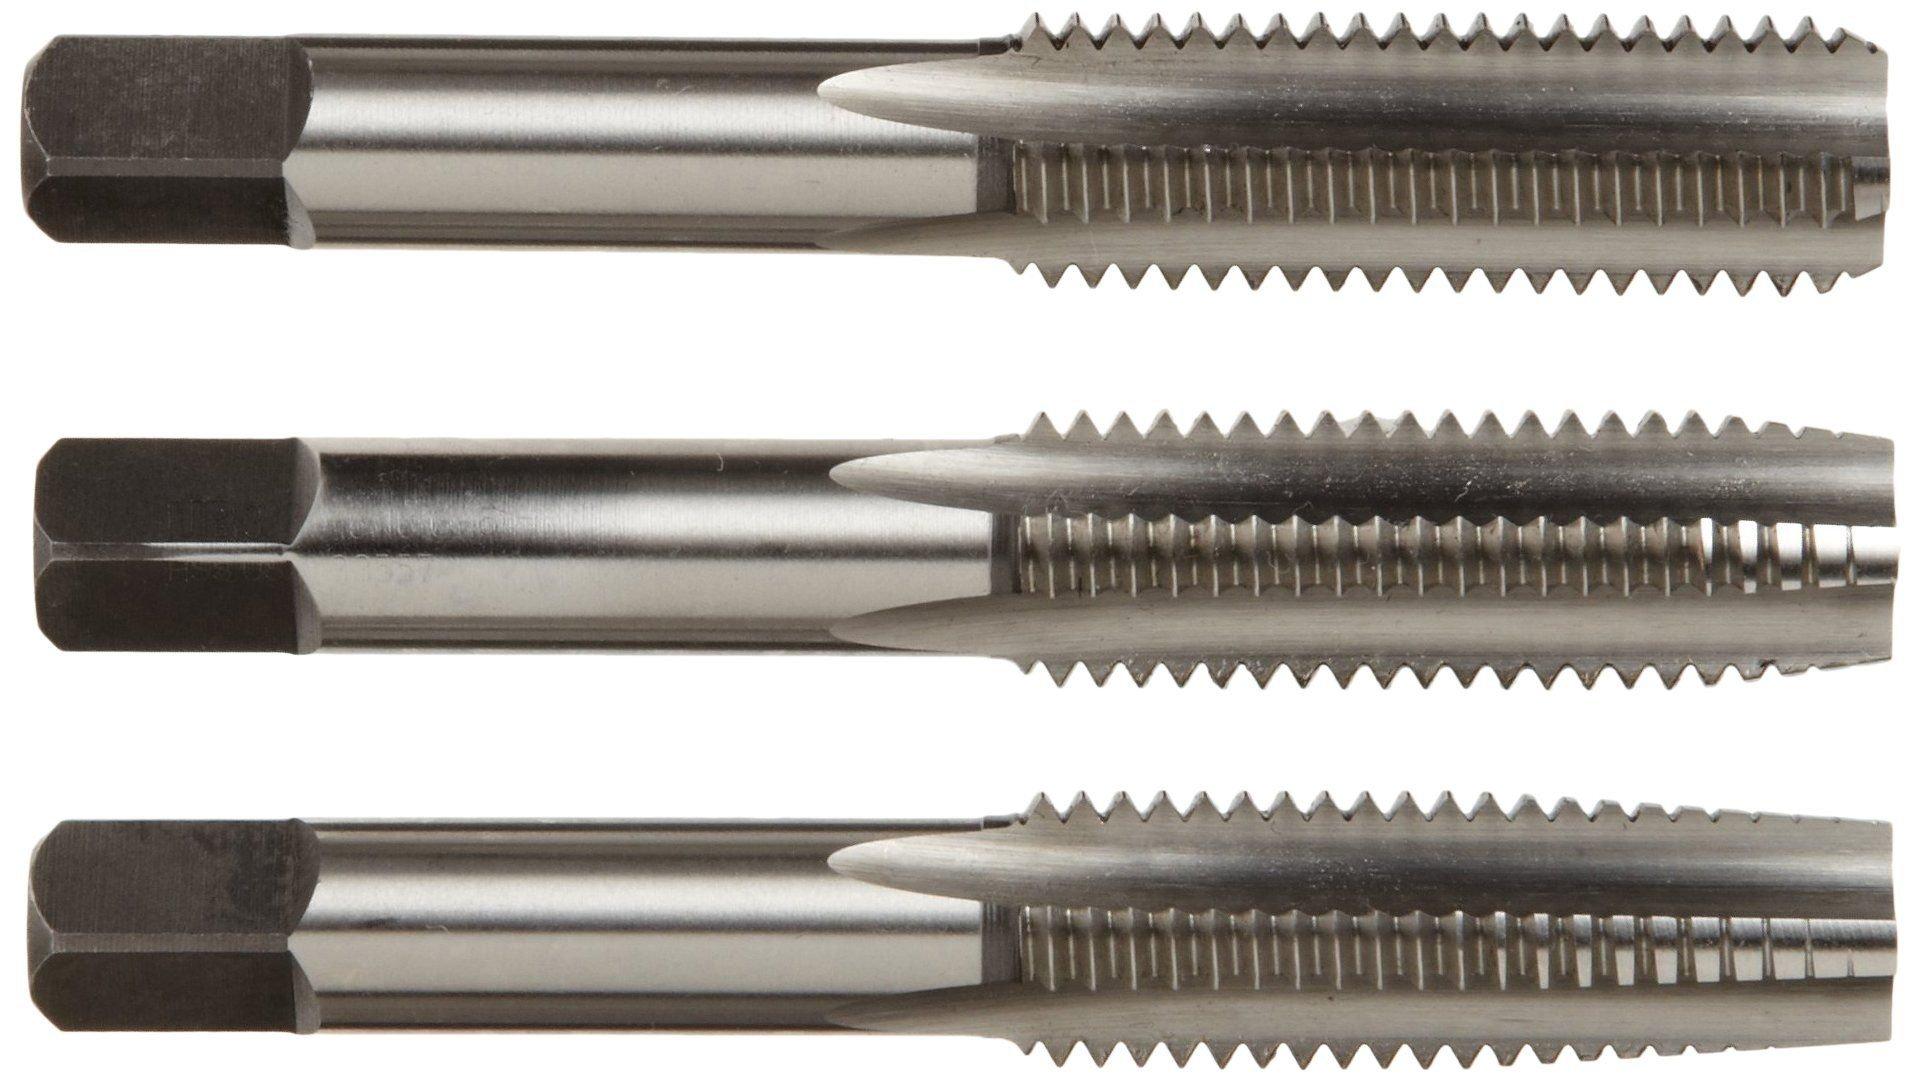 Alfa Tools CSHTS70533 1/4-28 Carbon Steel Hand Tap Set Taper/Plug/Bottom by Alfa Tools